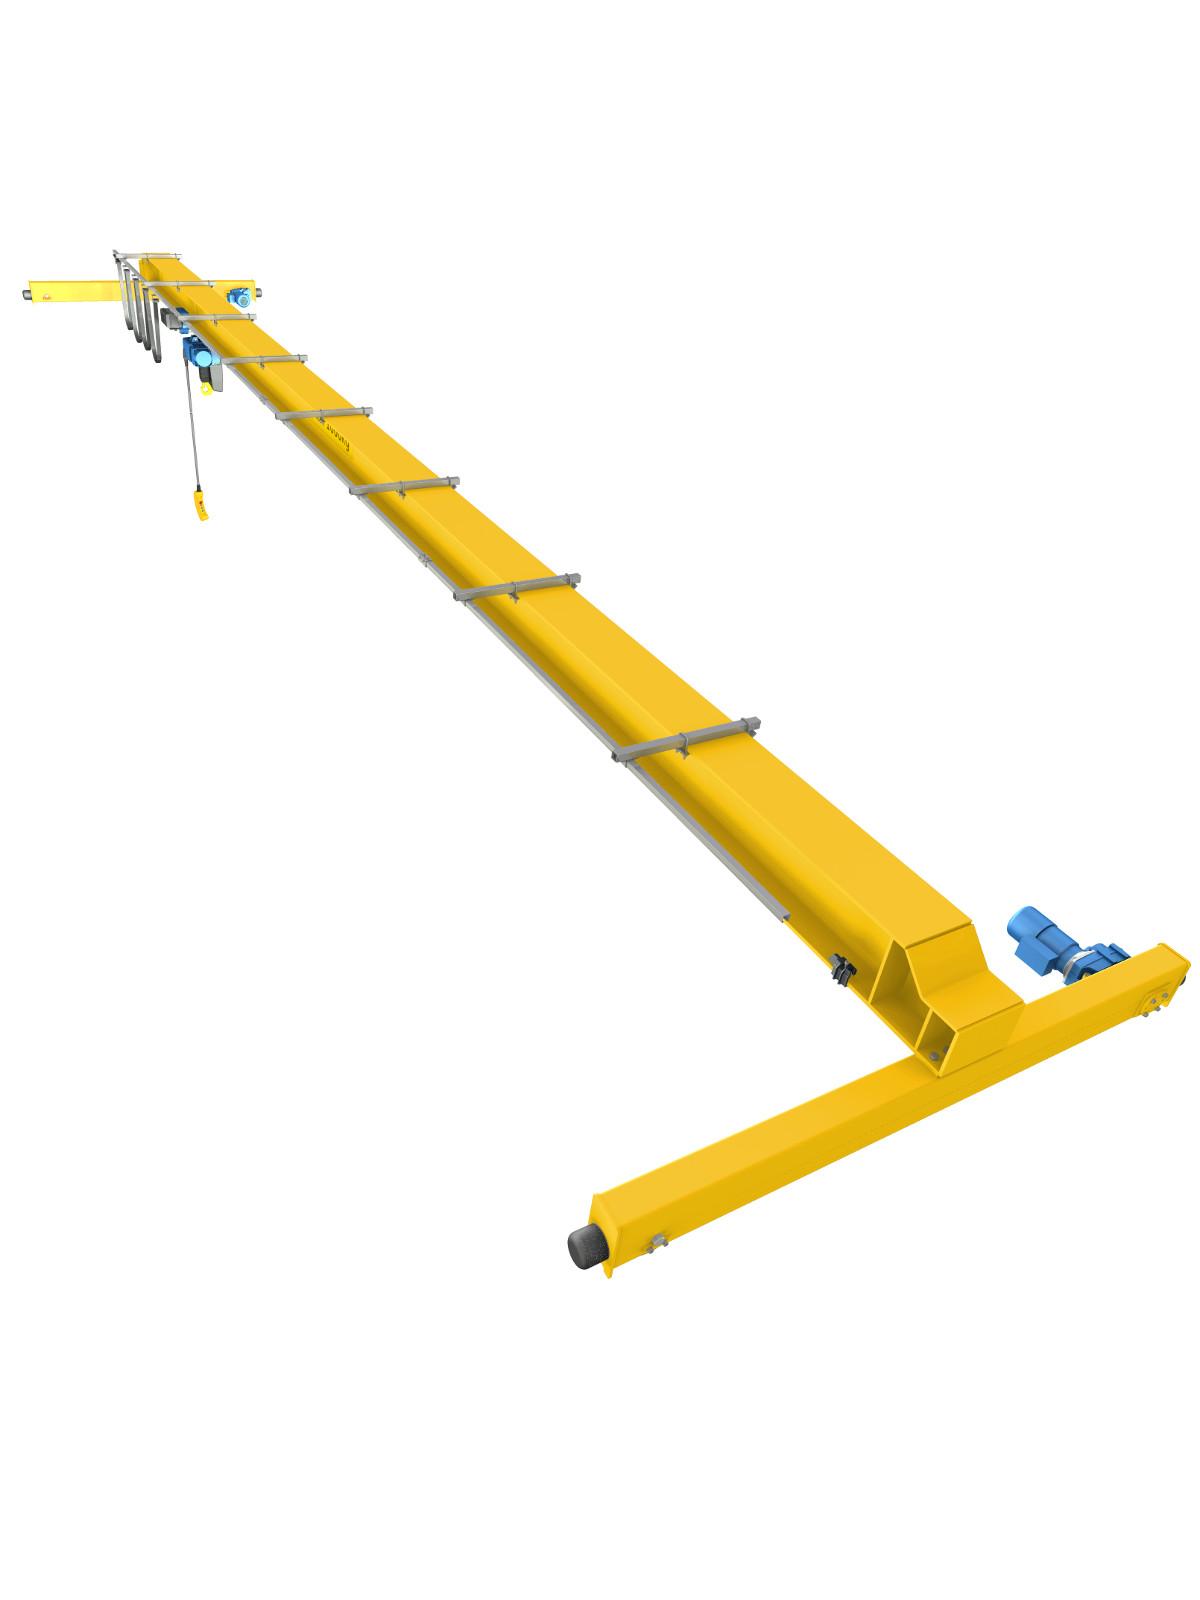 Overhead Crane Assembly : Single girder overhead crane d and cad design